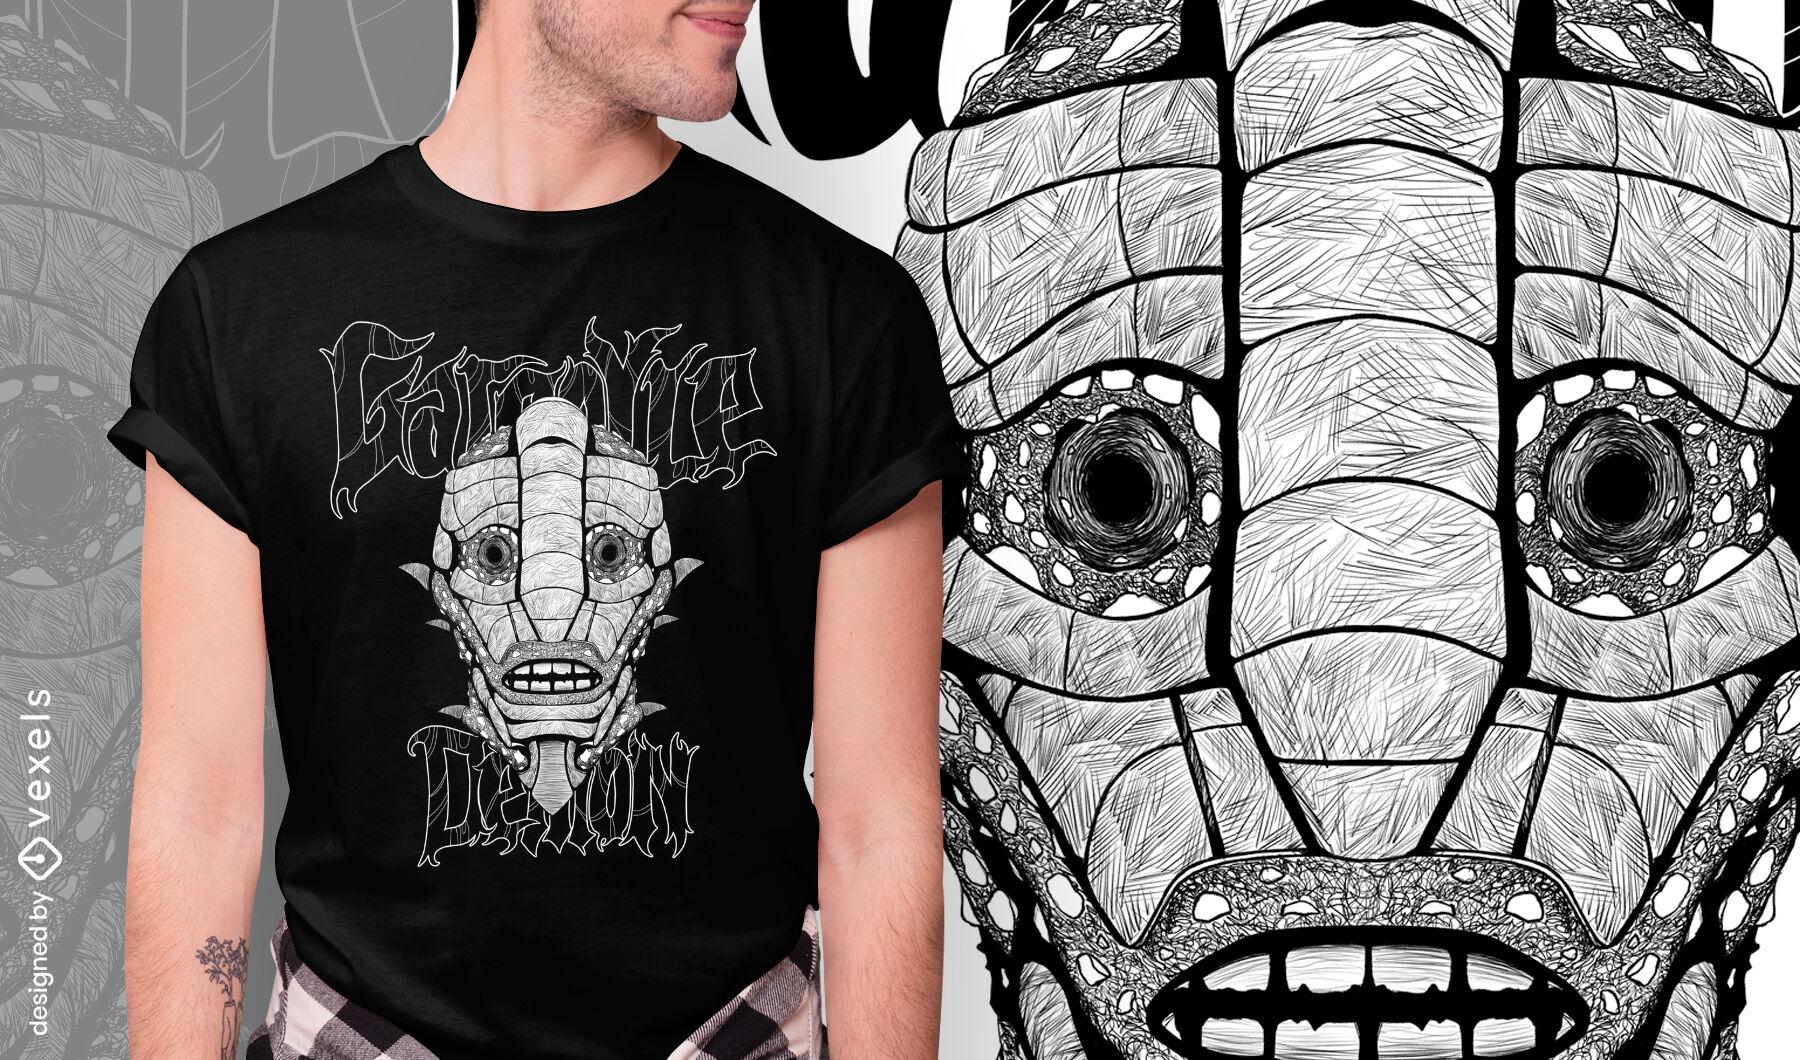 Creepy gargoyle monster hand drawn t-shirt psd